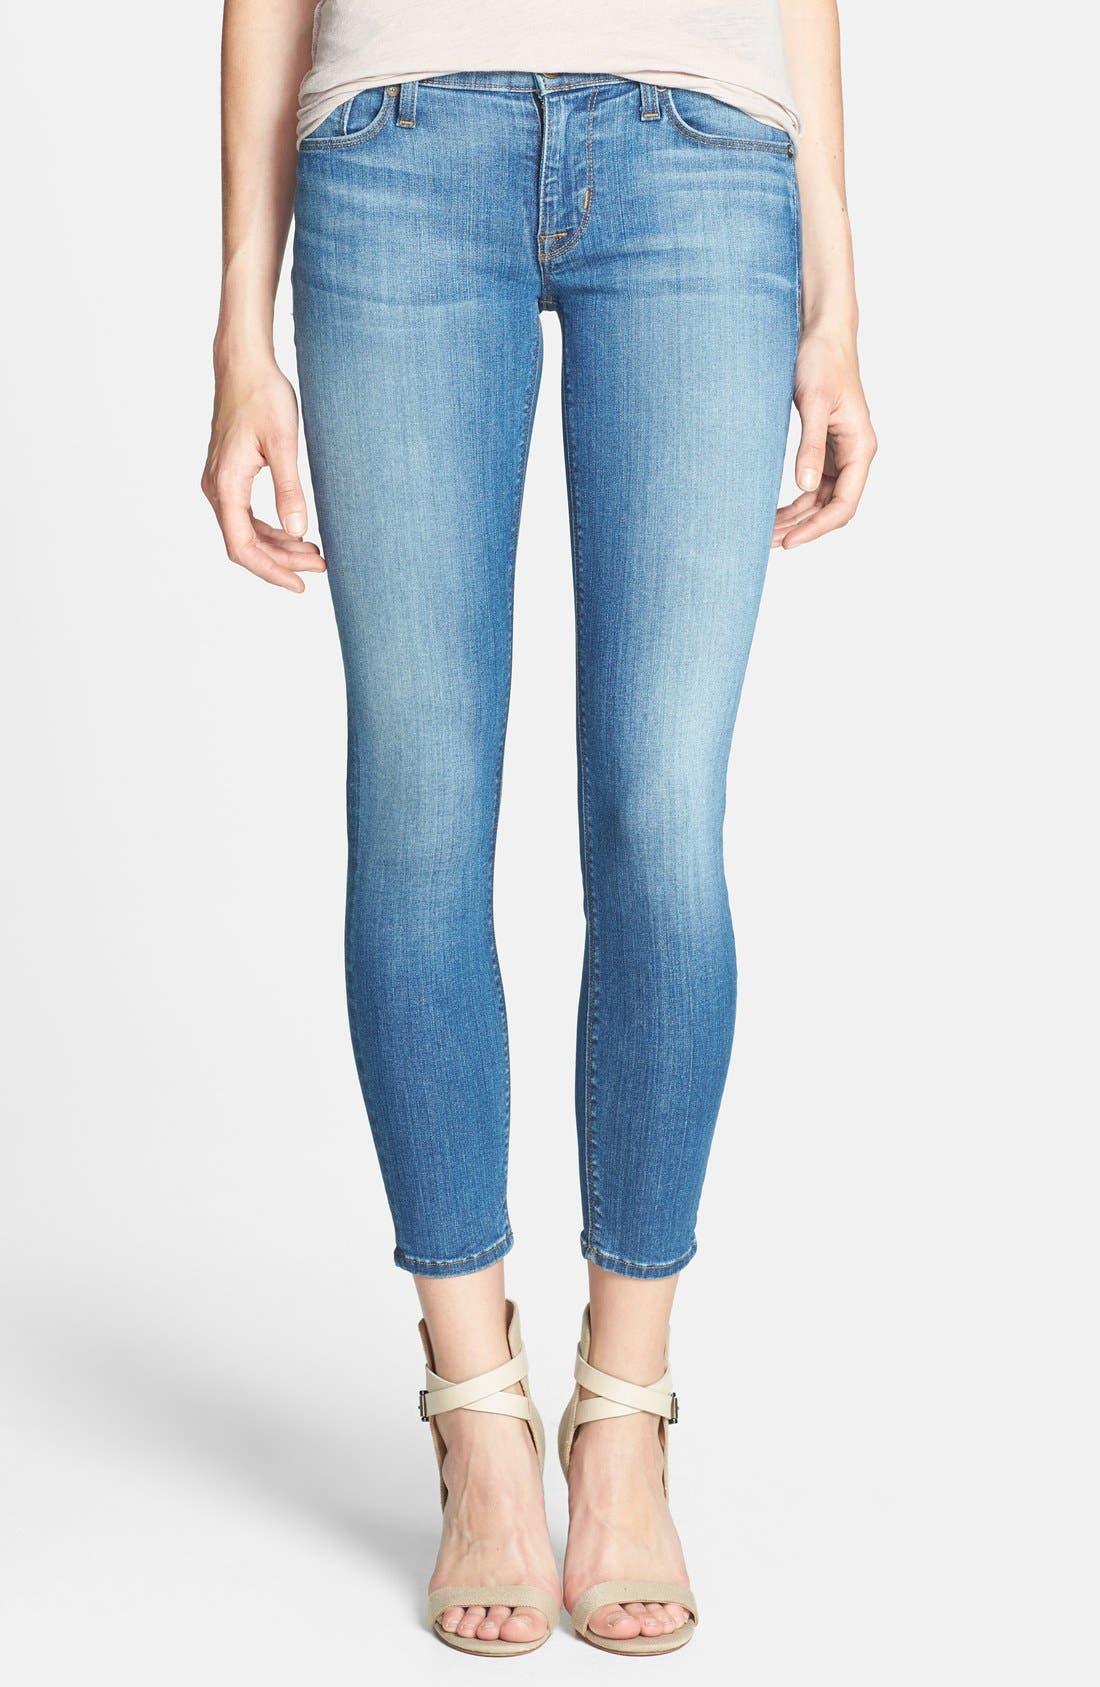 Main Image - Hudson Jeans 'Krista' Crop Super Skinny Jeans (Worship Me)